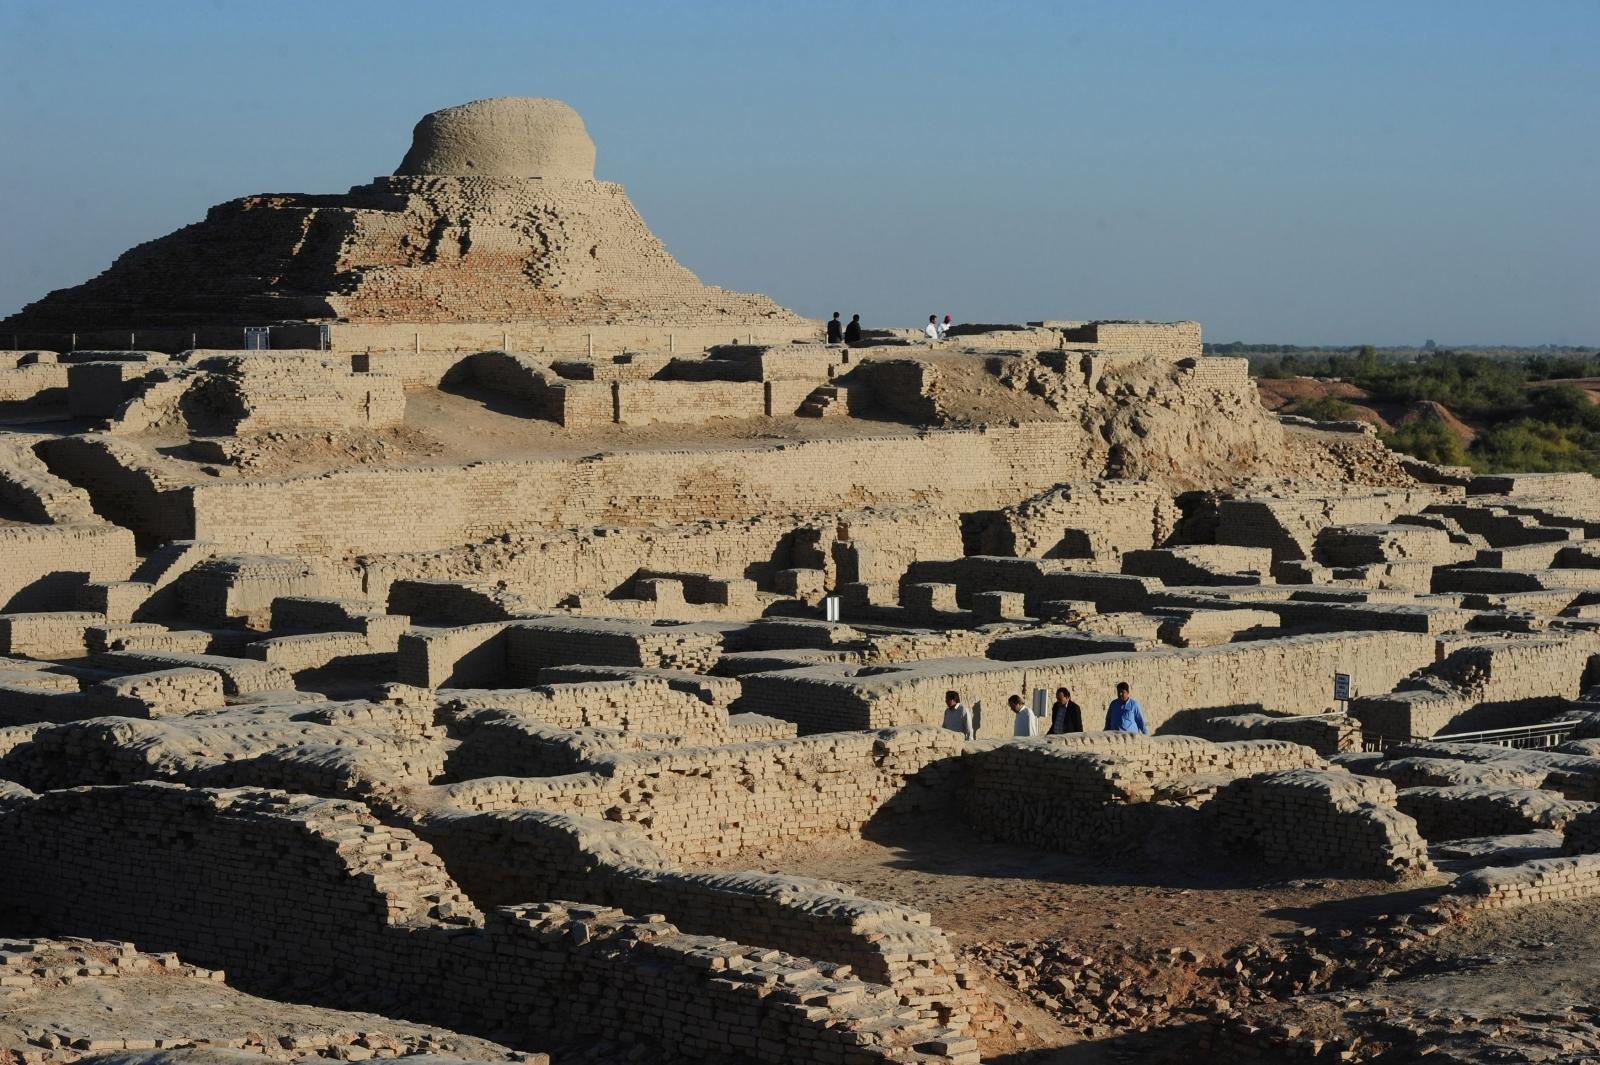 Mohenjo-daro, Indus Valley